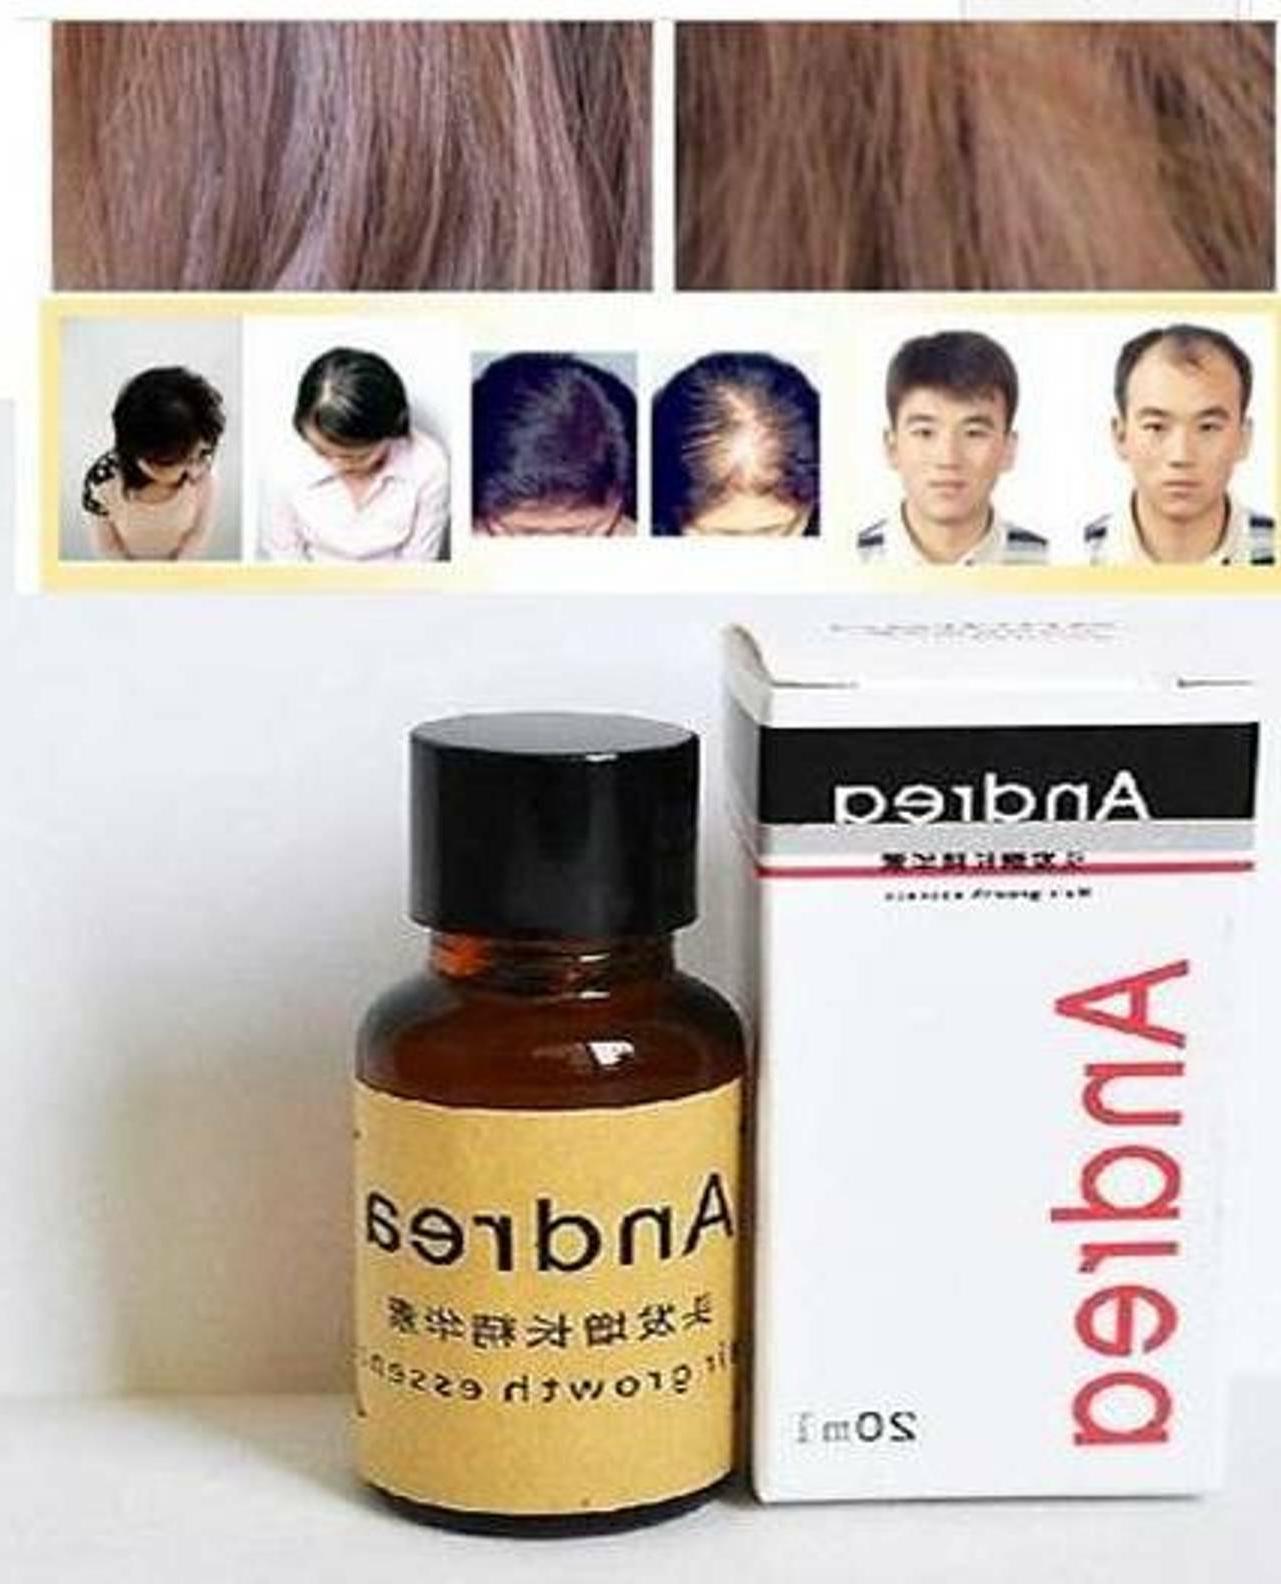 Andrea Hair Growth Hair Treatment ginger Sunburst raise